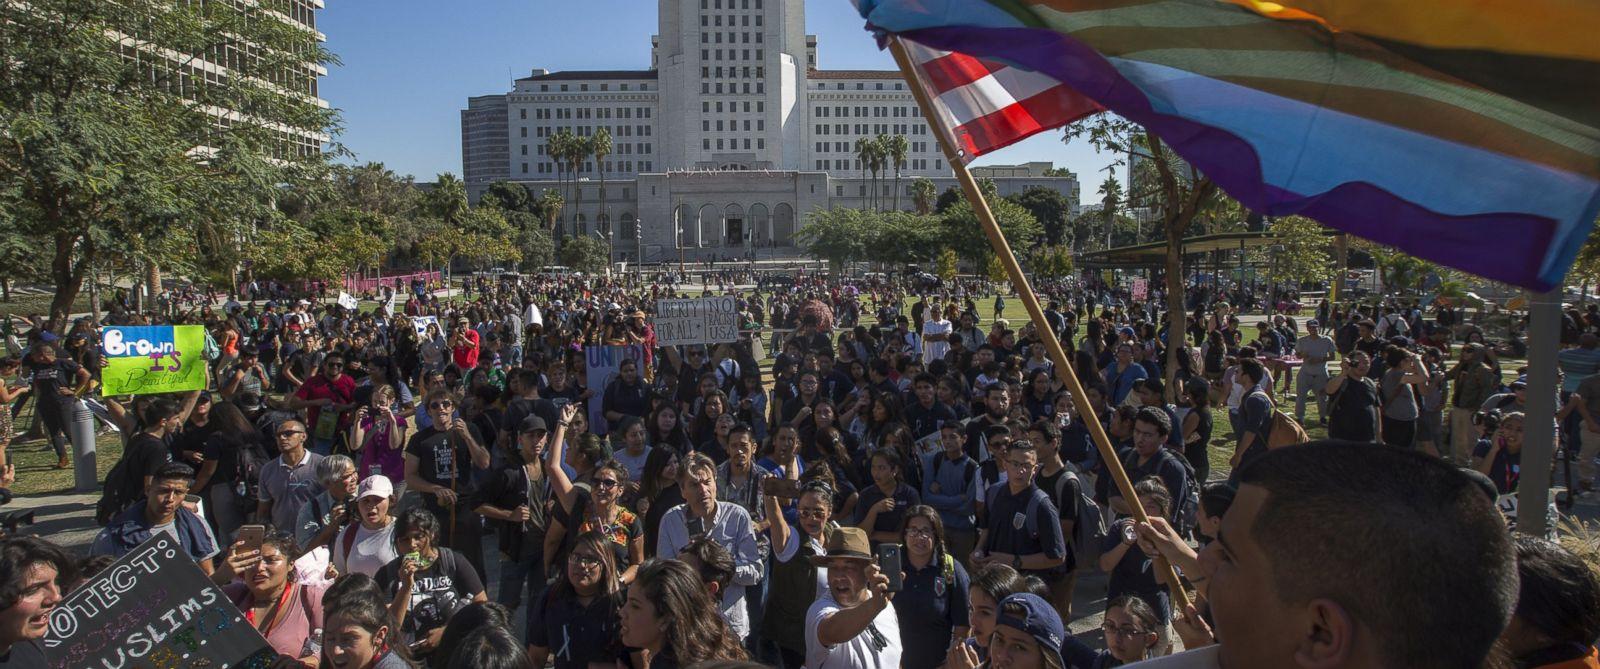 Anti Trump Protests Spread To Democratic Leadership With